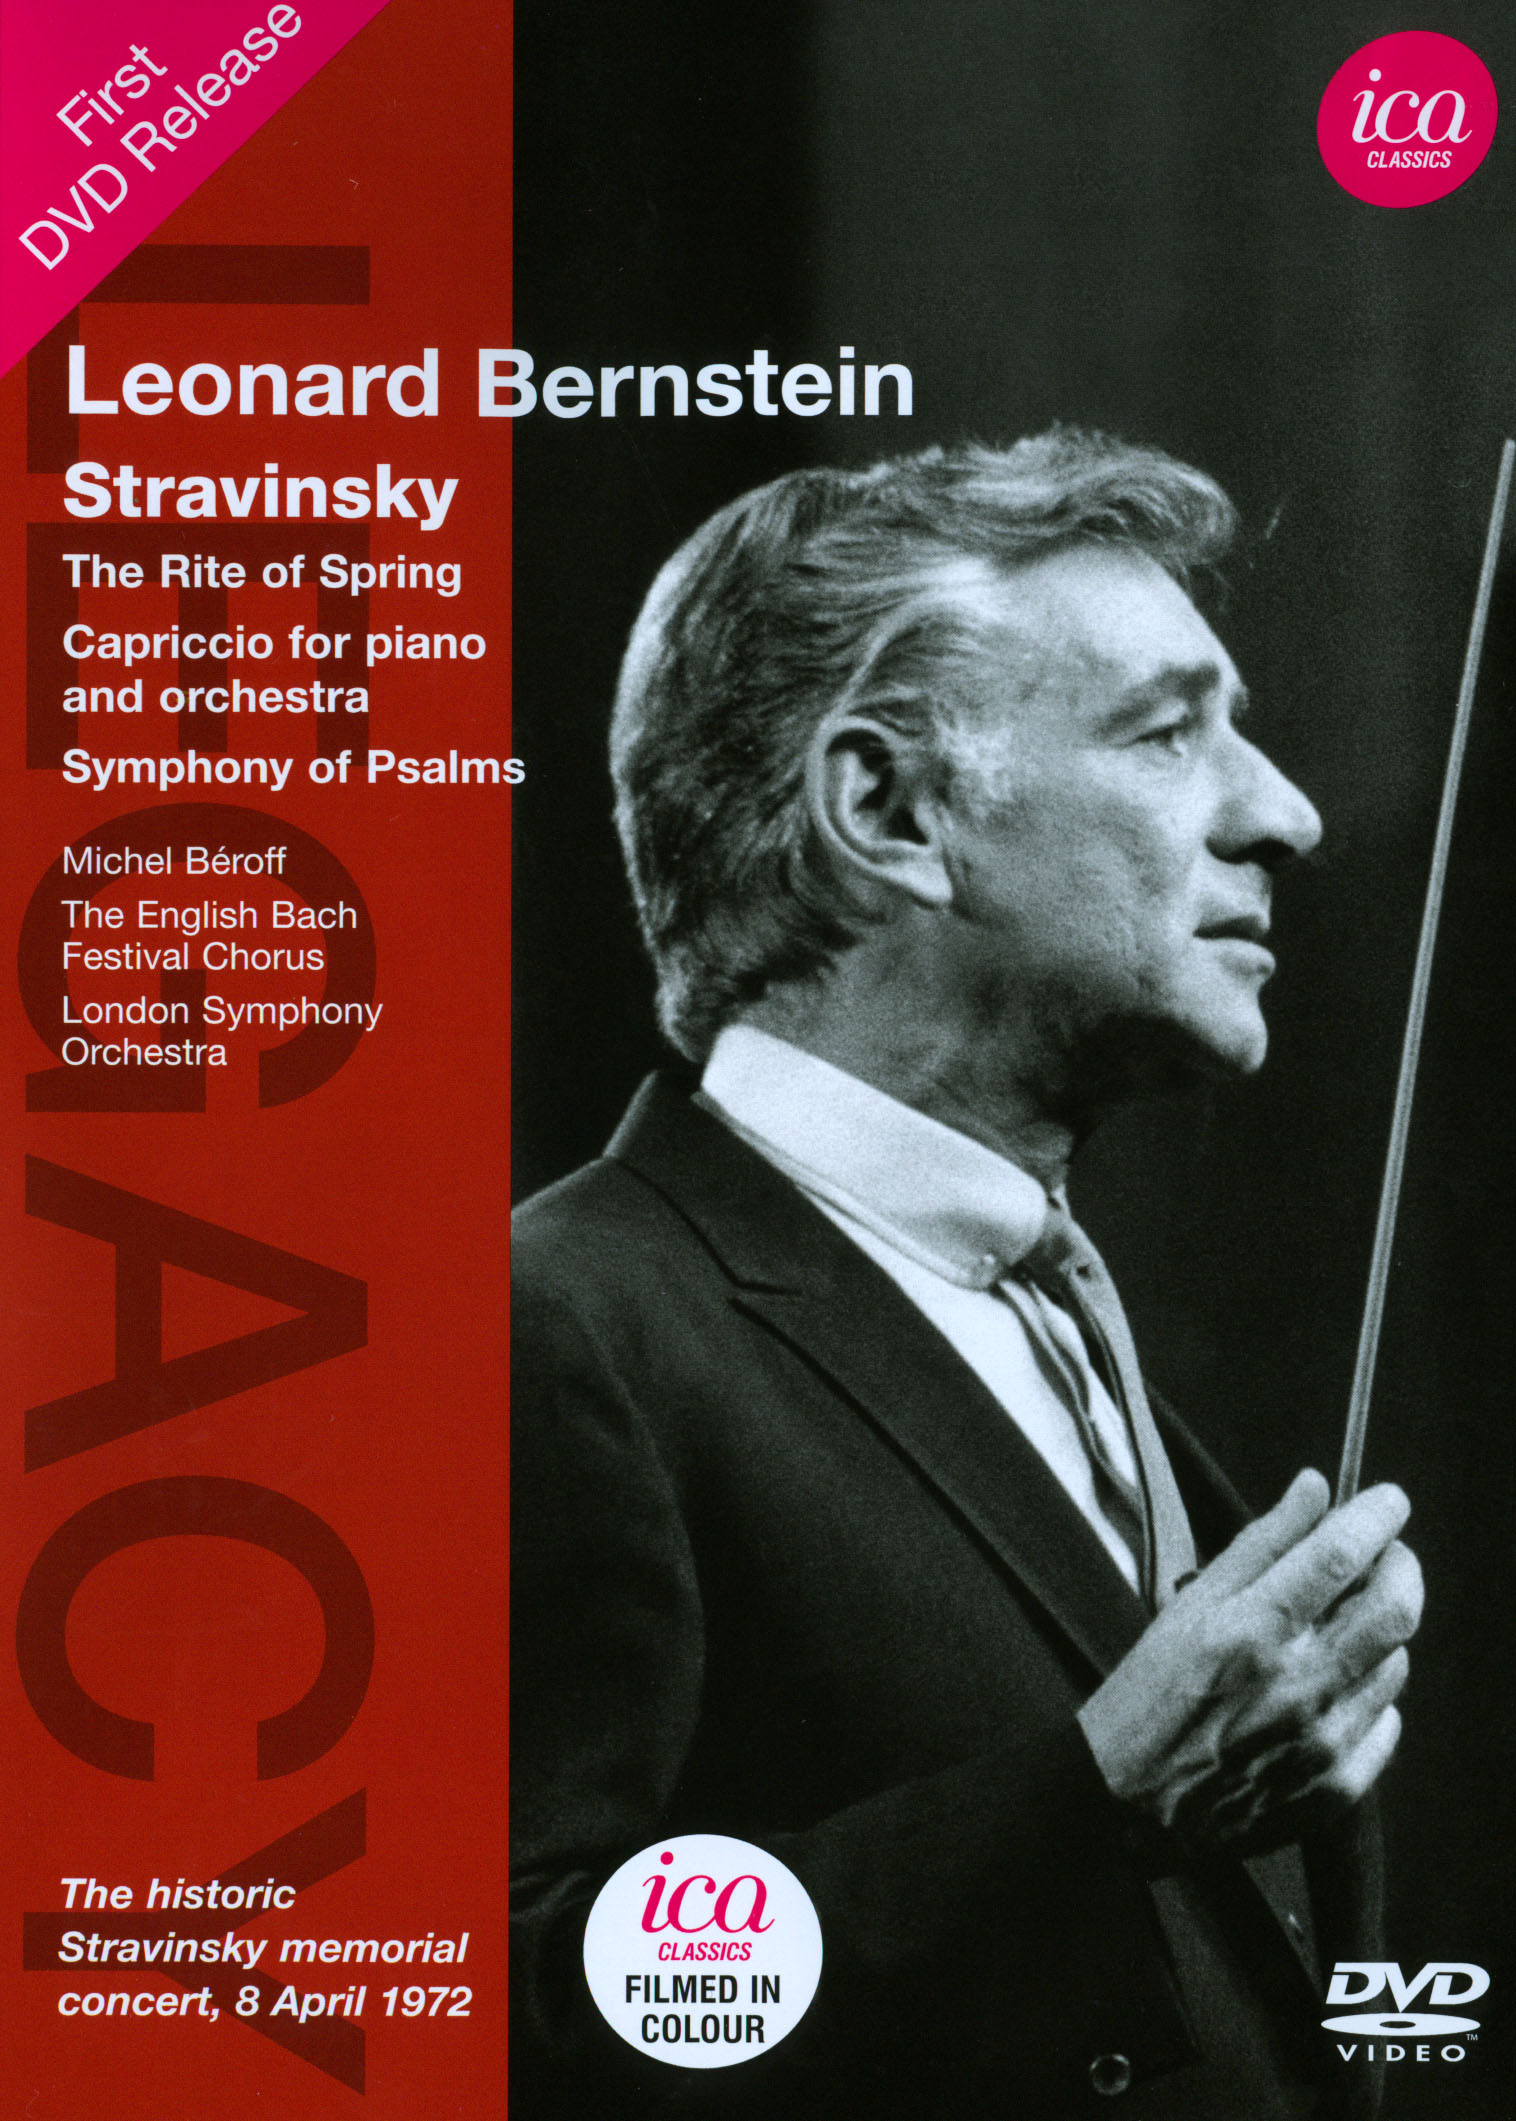 Leonard Bernstein: Stravinsky - The Rite of Spring/Capriccio for Piano & Orchestra/Symphony of Psalms